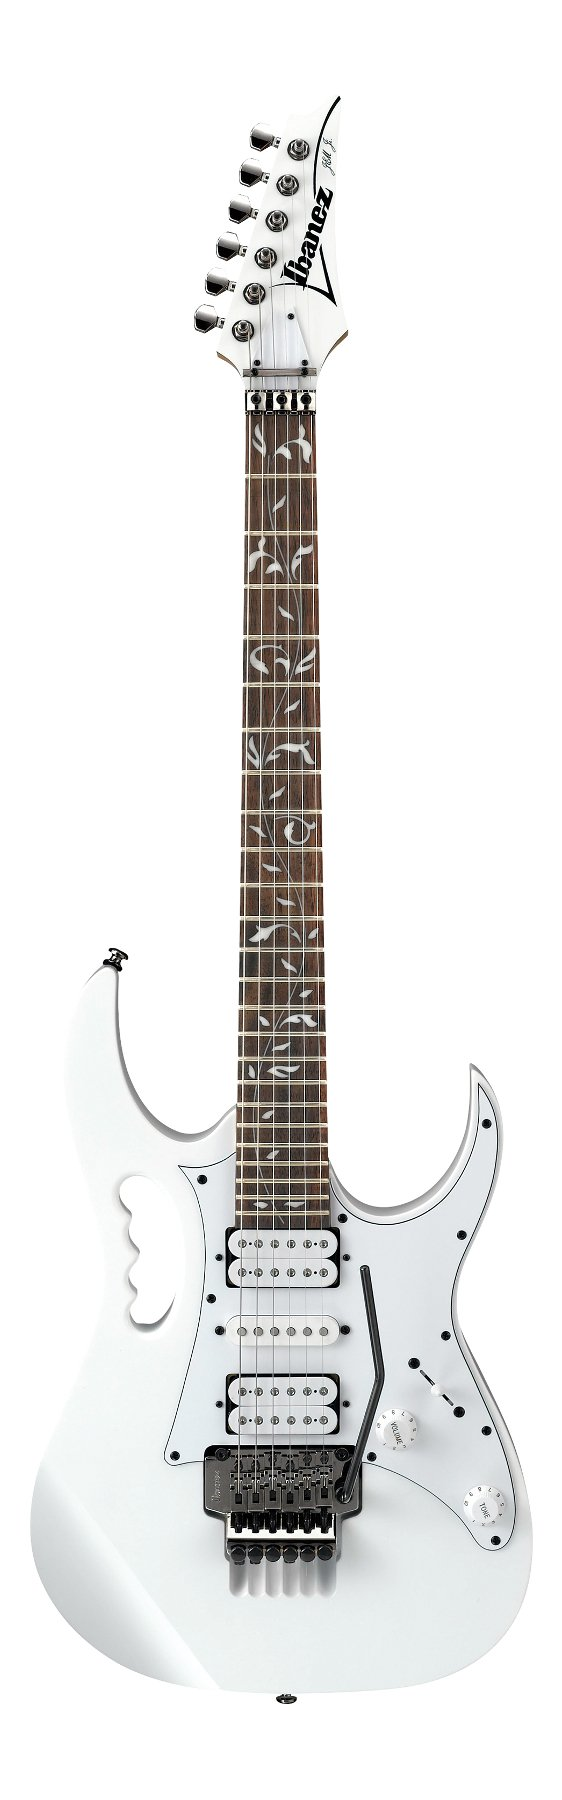 White Steve Vai Signature Series Electric Guitar